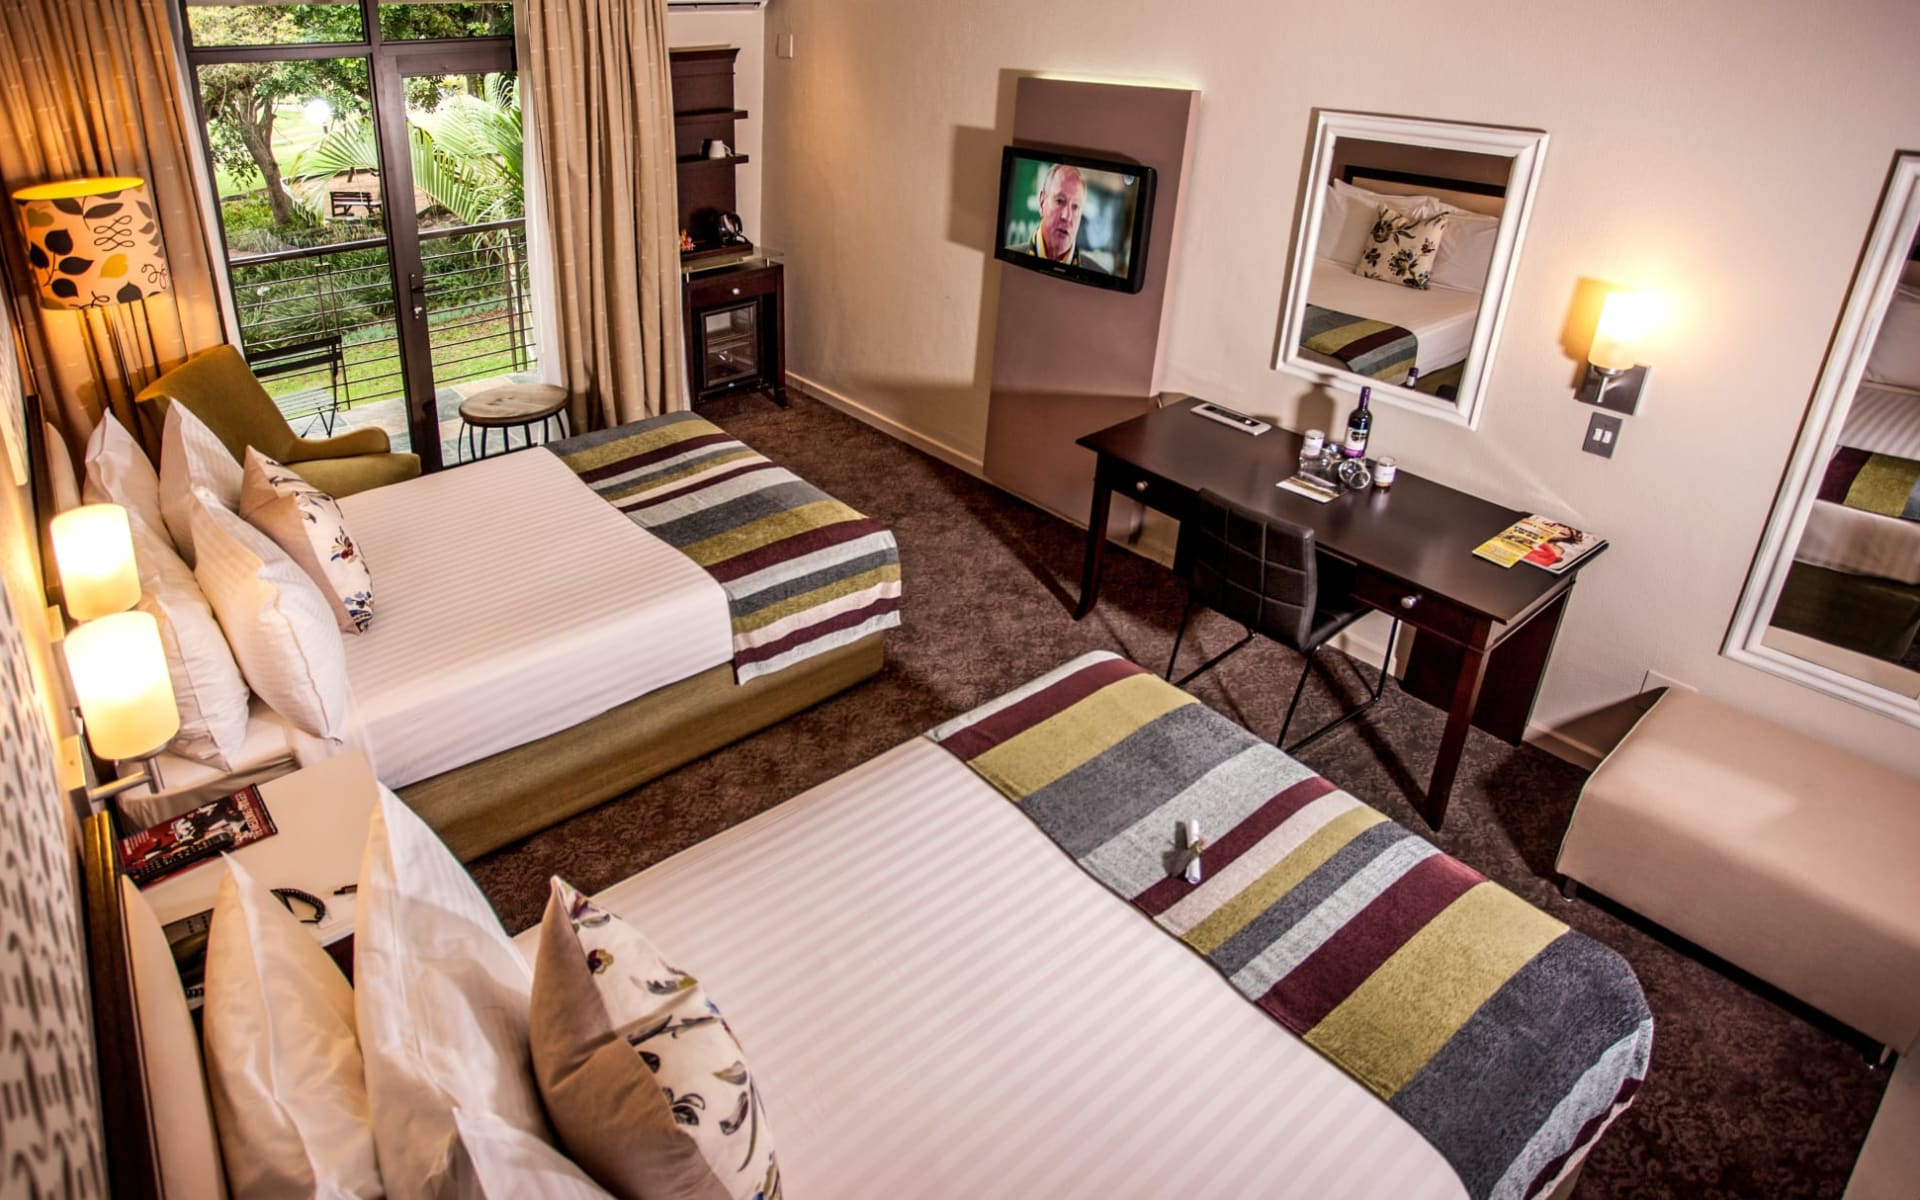 Sabi River Sun Resort in Hazyview:  Sabi River Sun Resort - Hotelzimmer